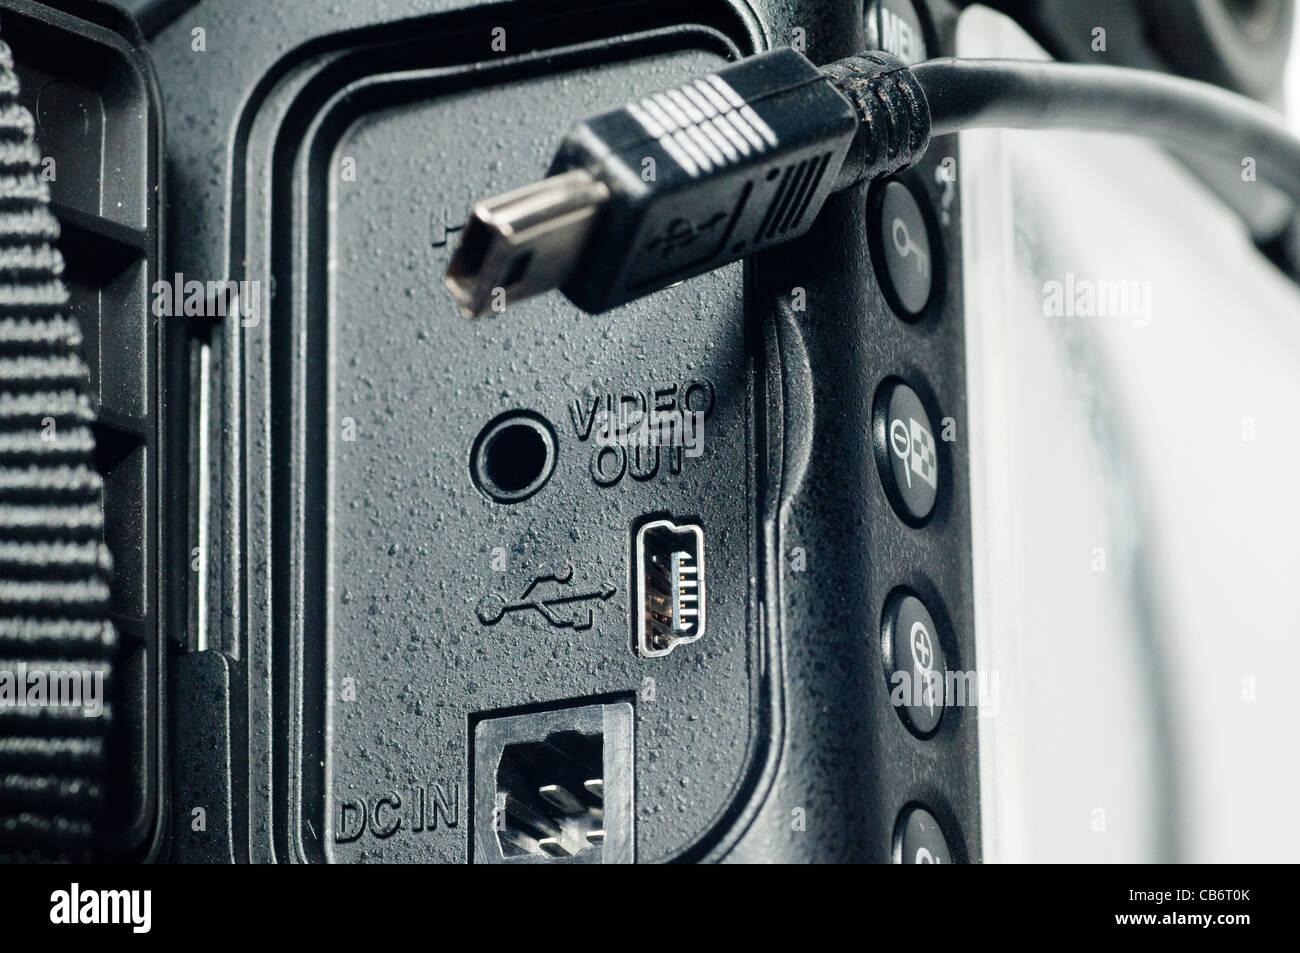 USB 'Type B' female connection on camera - Stock Image